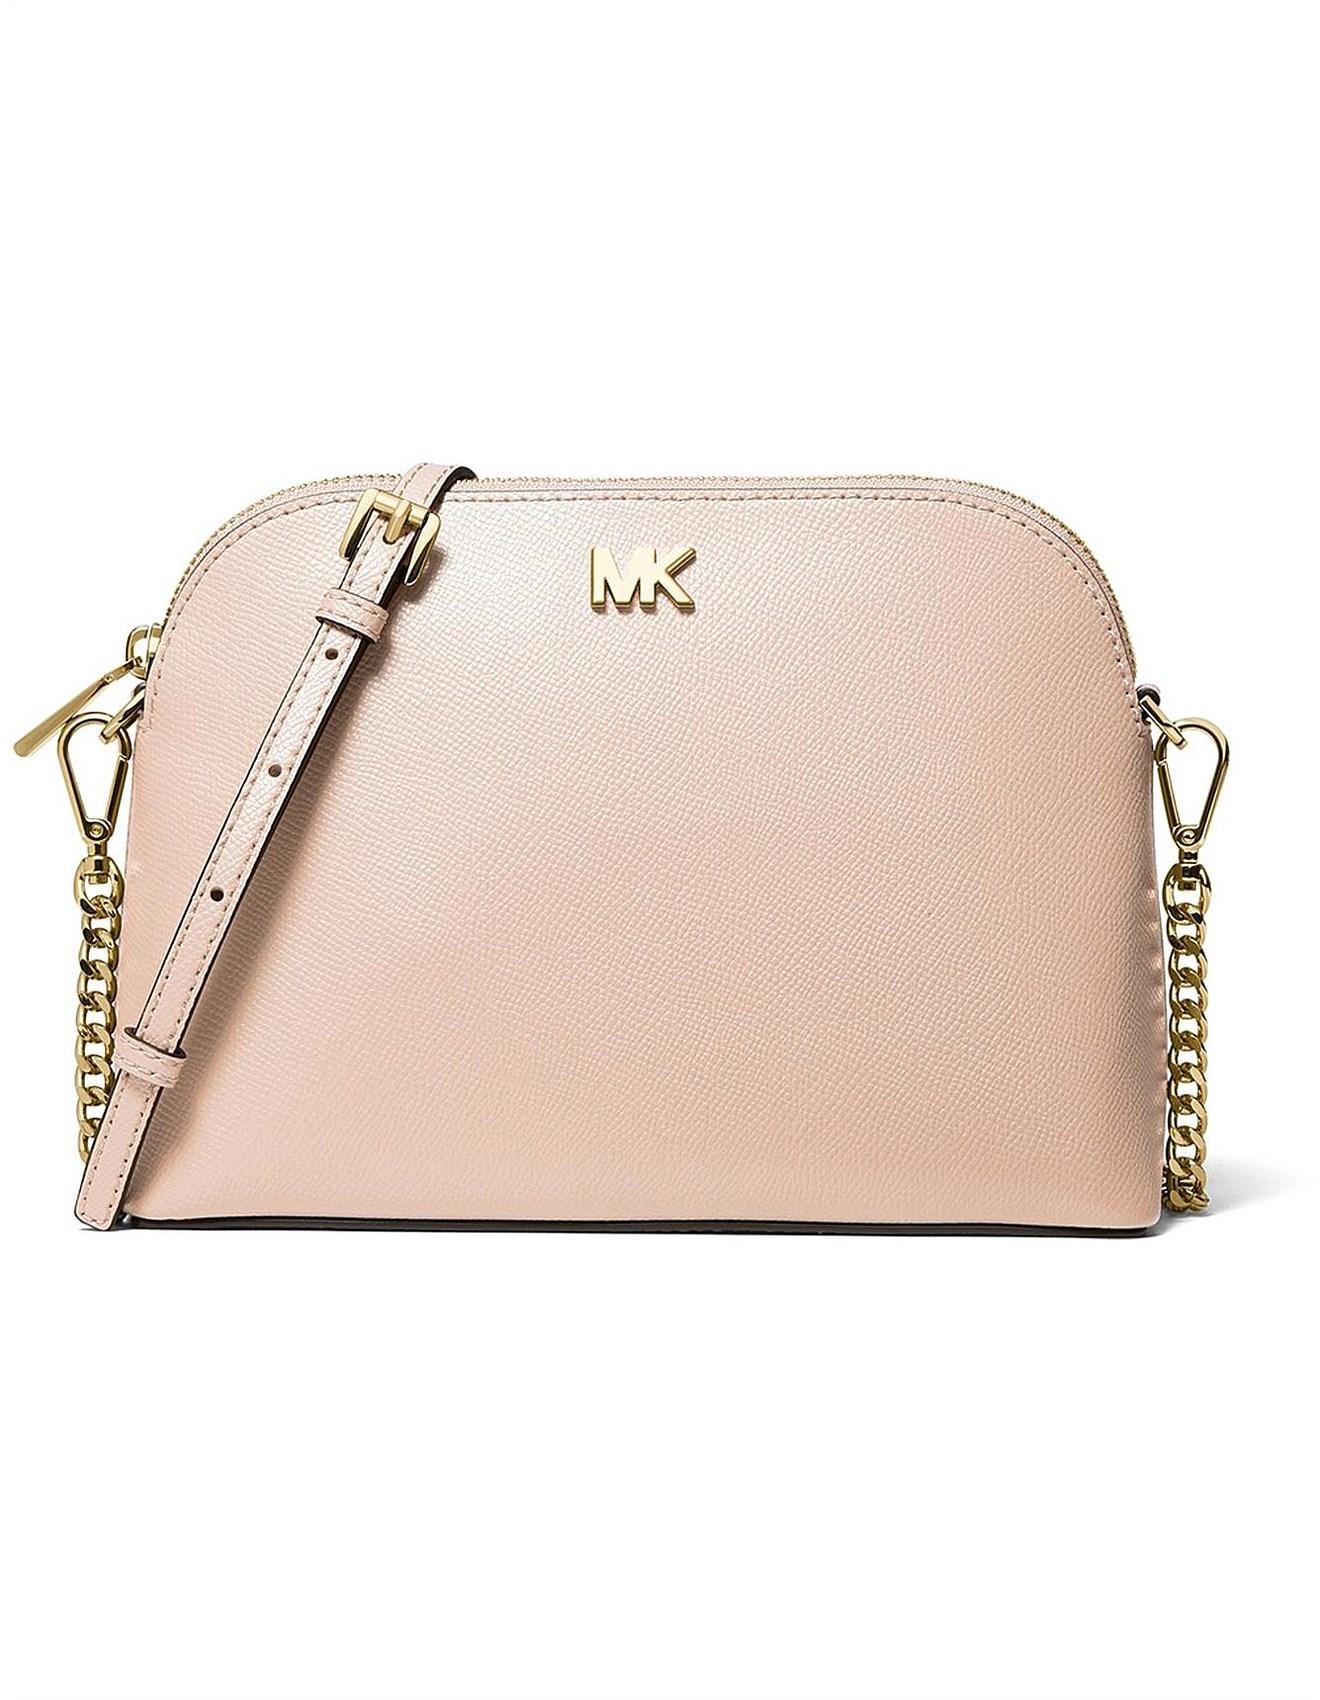 fe86947244b7 Women's Bags   Handbags, Clutches, Tote Bags Online   David Jones ...